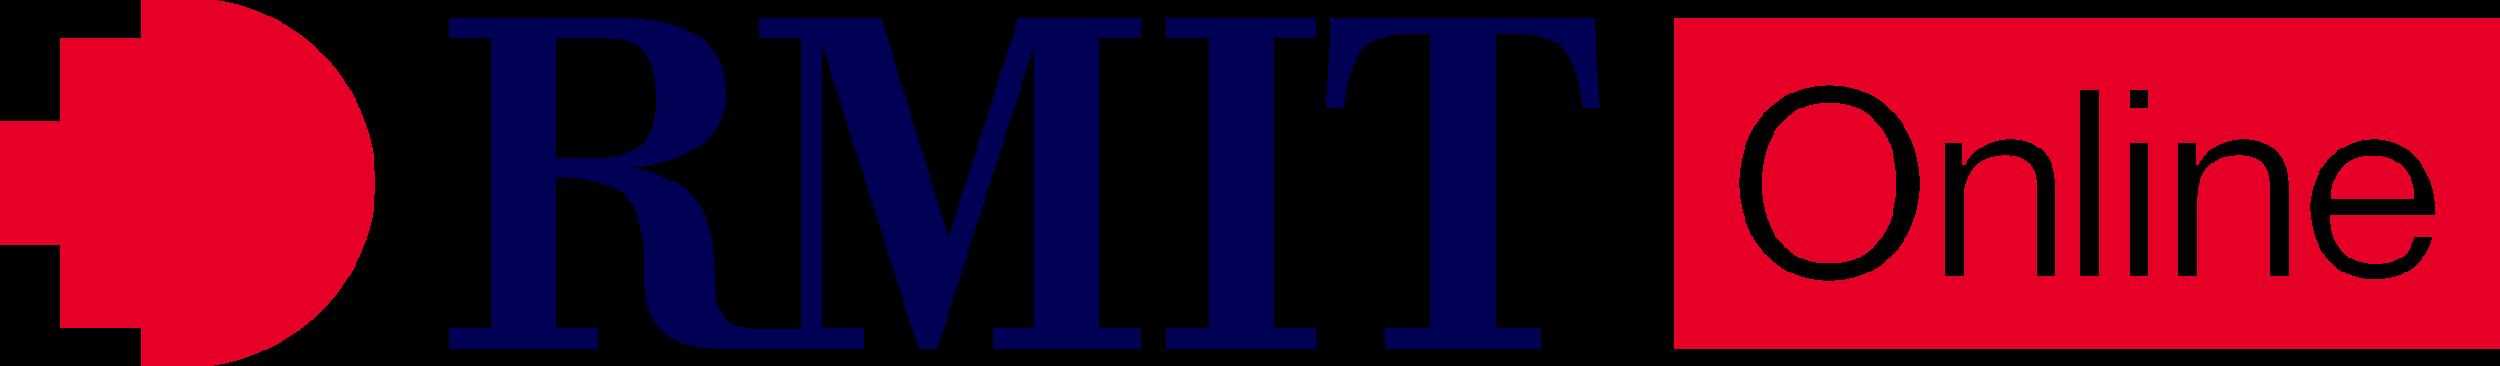 RMIT Online Primary Logo - Digital Colour RGB.png